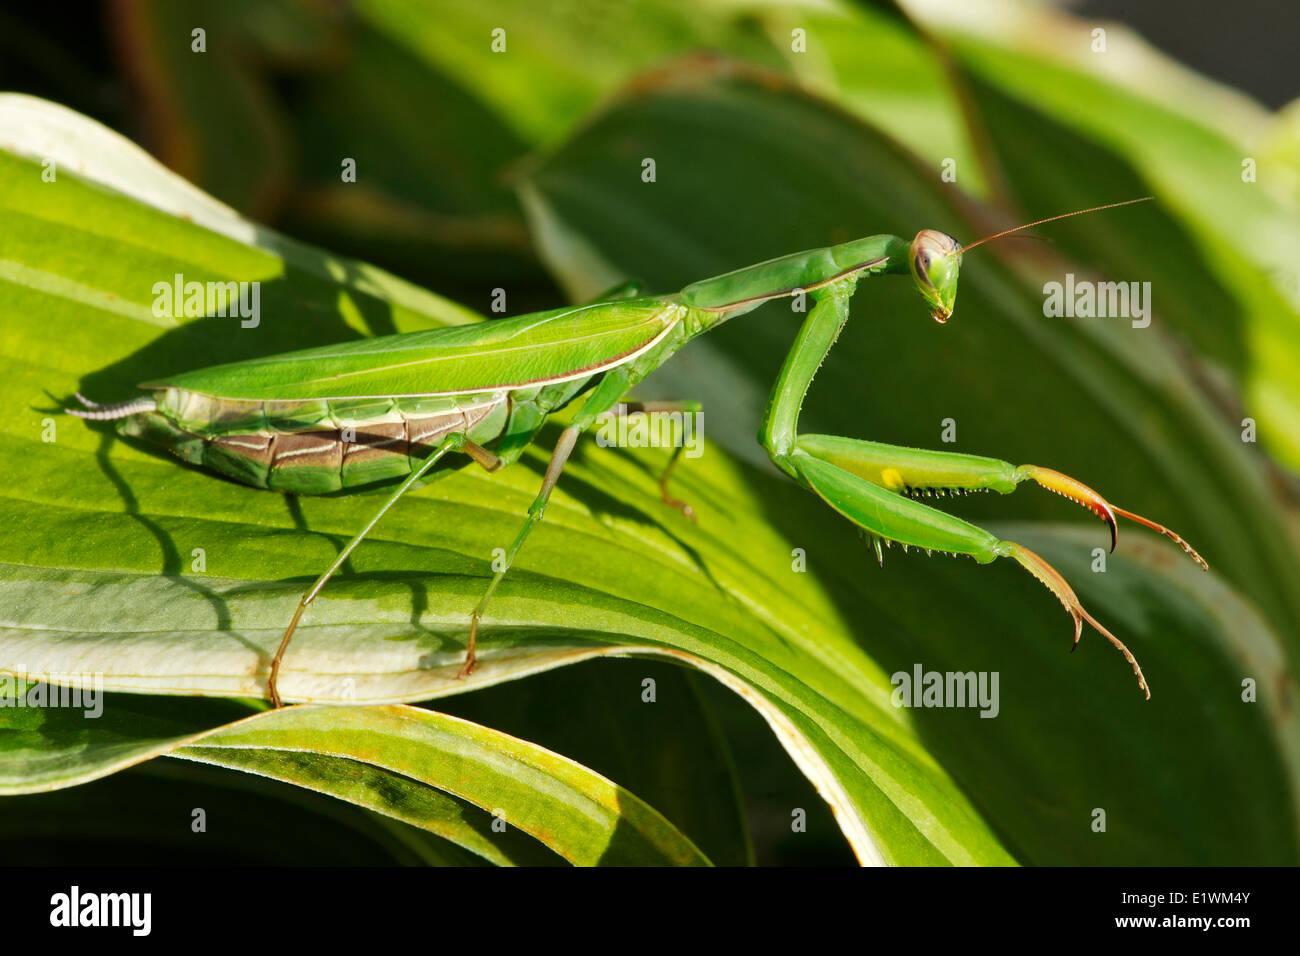 Kurzärmelig (Mantis Religiosa) zu beten-Mantodea Ordnung der Insekten, Gatineau, Quebec, Kanada. Stockbild